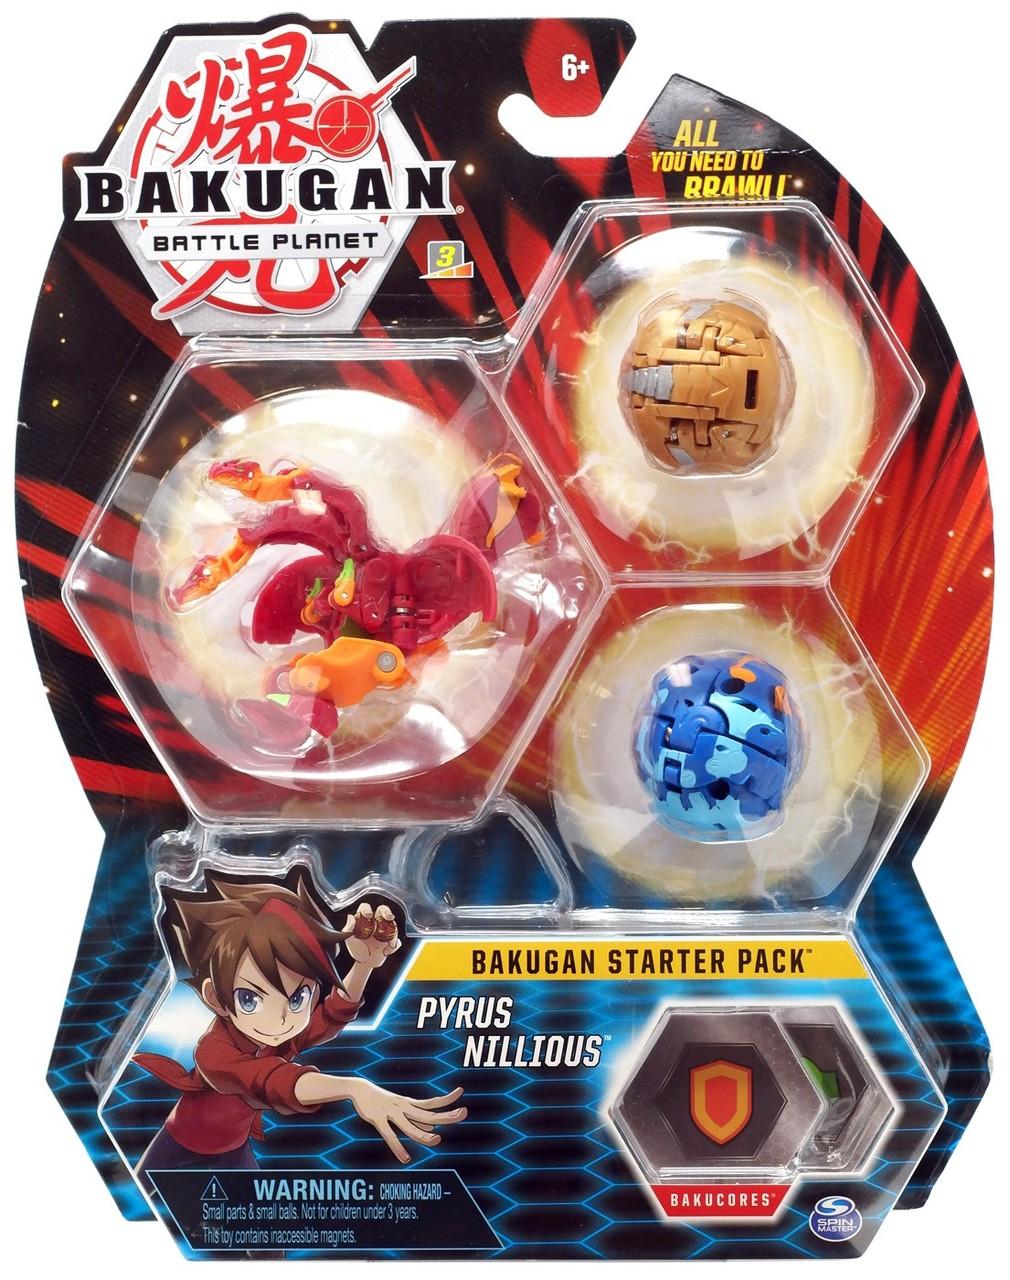 Bakugan starter pack Pyrus Nillious